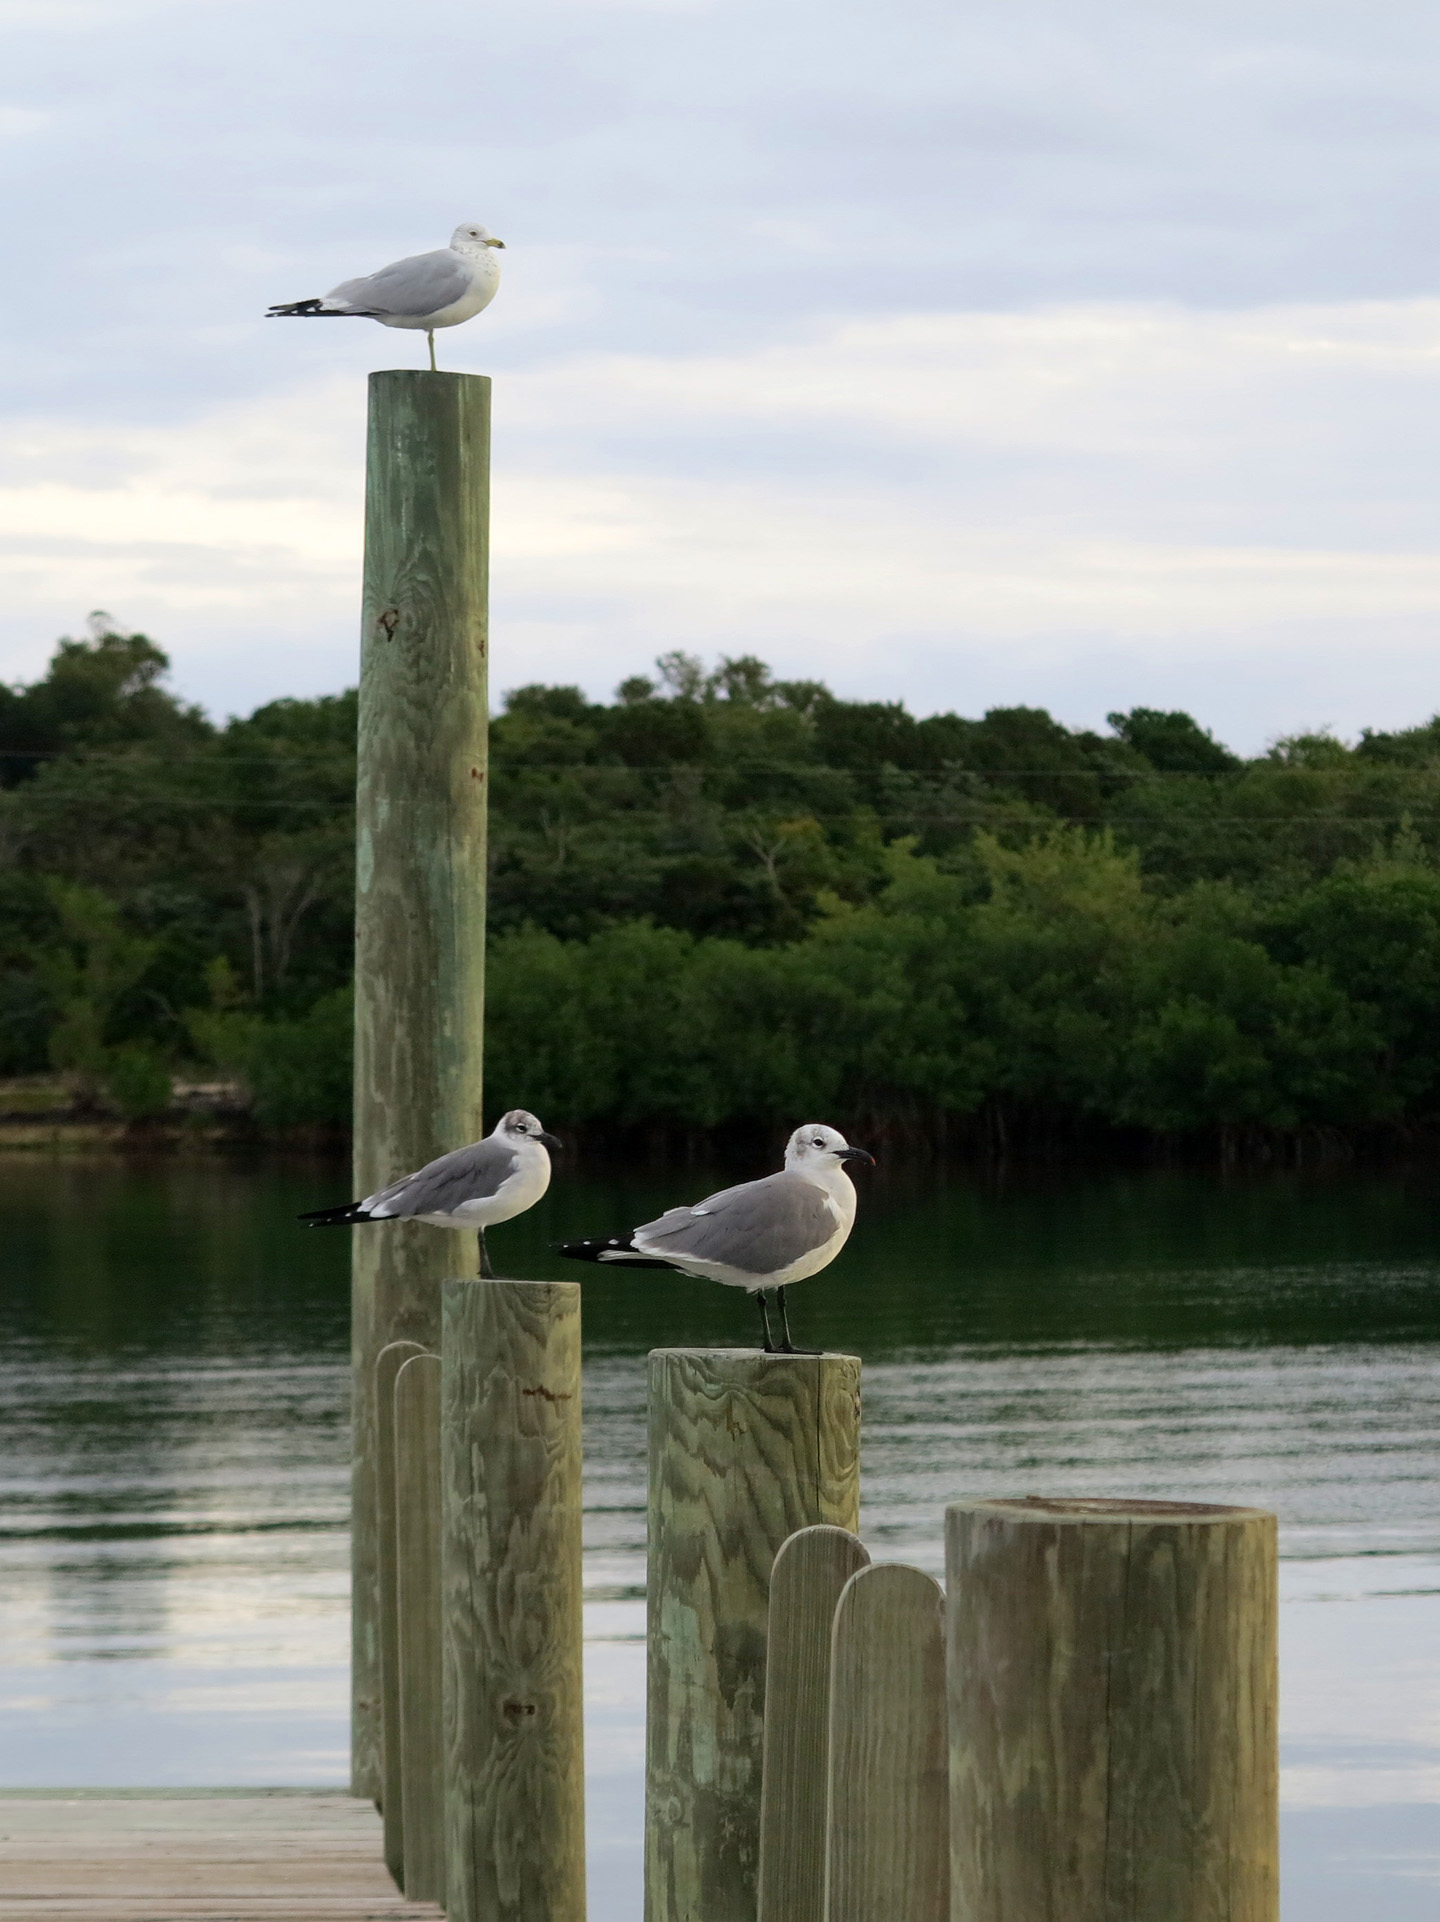 Seagulls in Settlement Creek, Green Turtle Cay, Bahamas